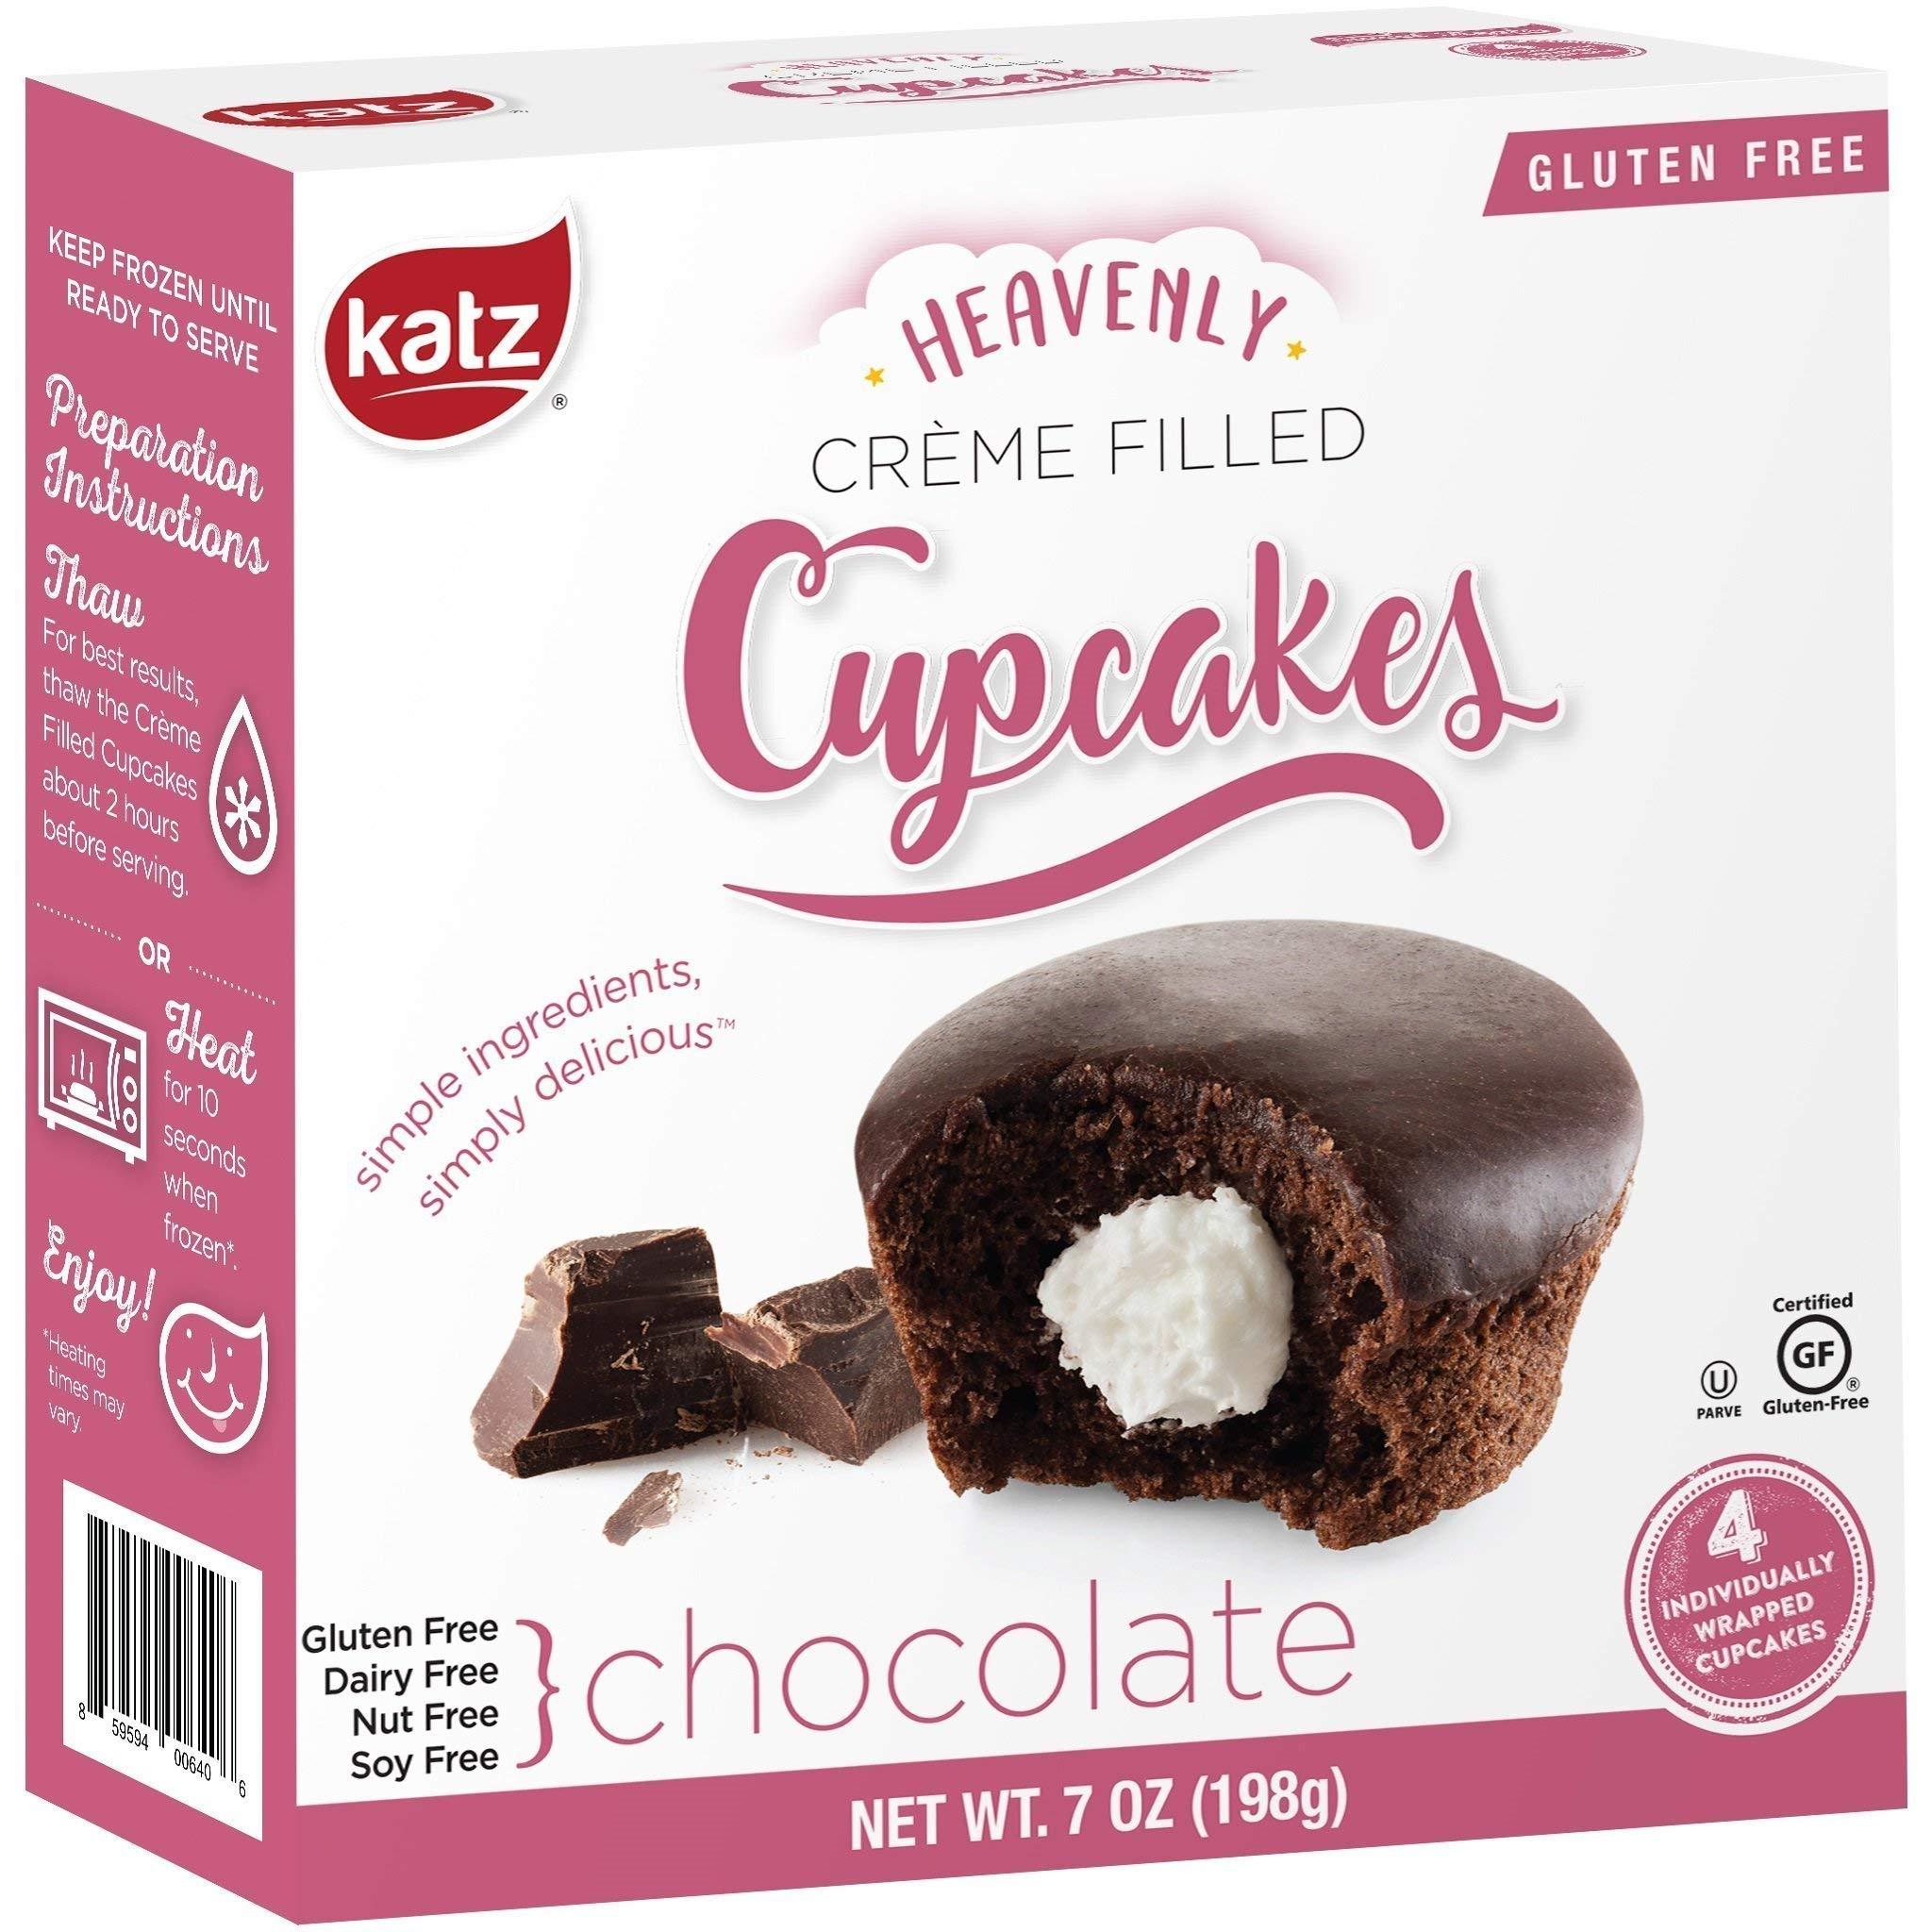 Katz Gluten Free Chocolate Crème Filled Cupcakes | Dairy Free, Nut Free, Soy Free, Gluten Free | Kosher (6 Packs of 4 Crème Cupcakes, 7 Ounce Each)